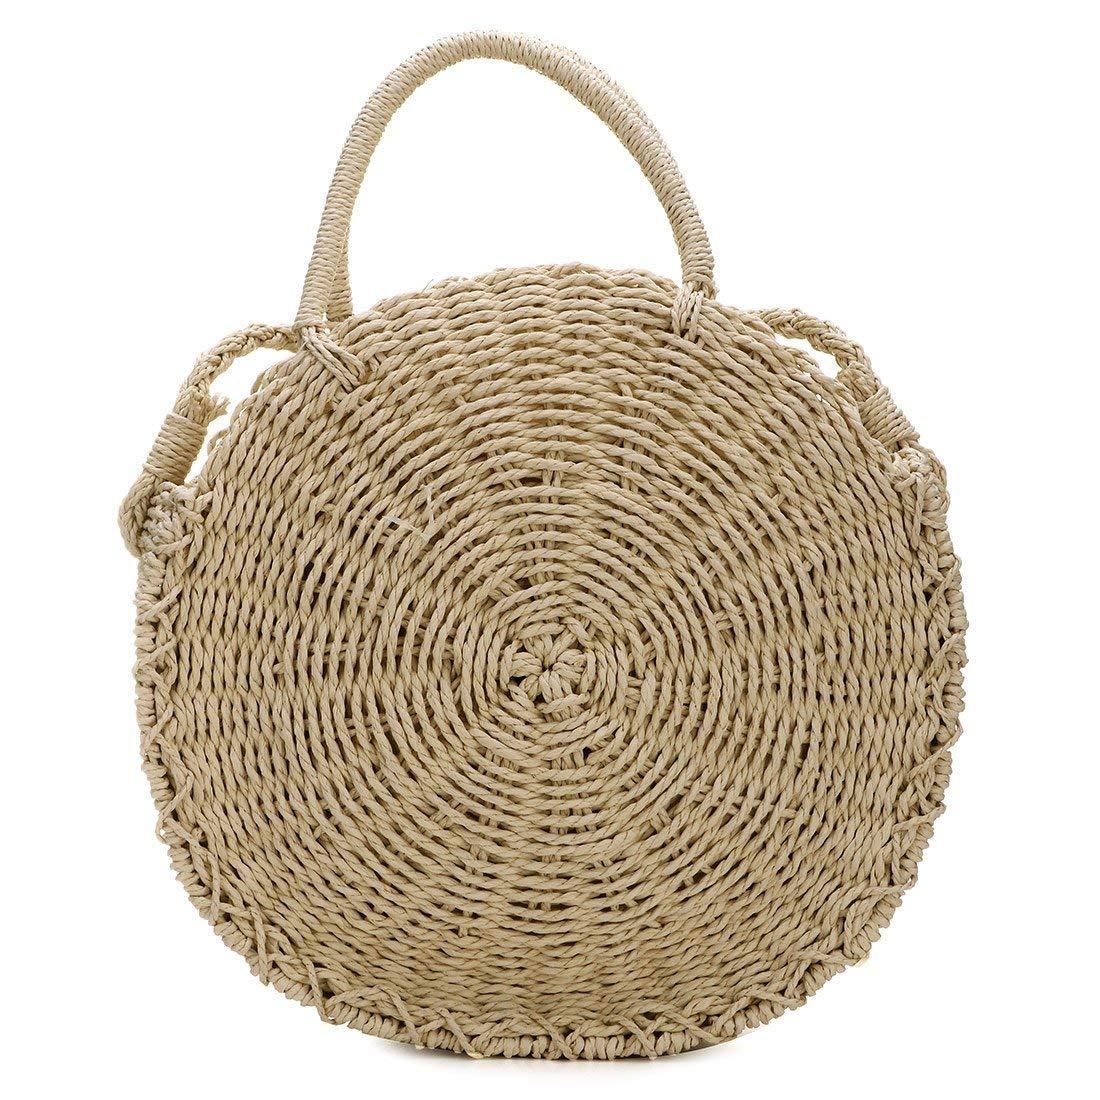 Meeto Straw Crossbody Bag Women Weave Shoulder Bag Straw Handbag Round Summer Beach Purse and Handbags Bohemia Style Beach Zipper Totes For Ladies Girls (Khaki)